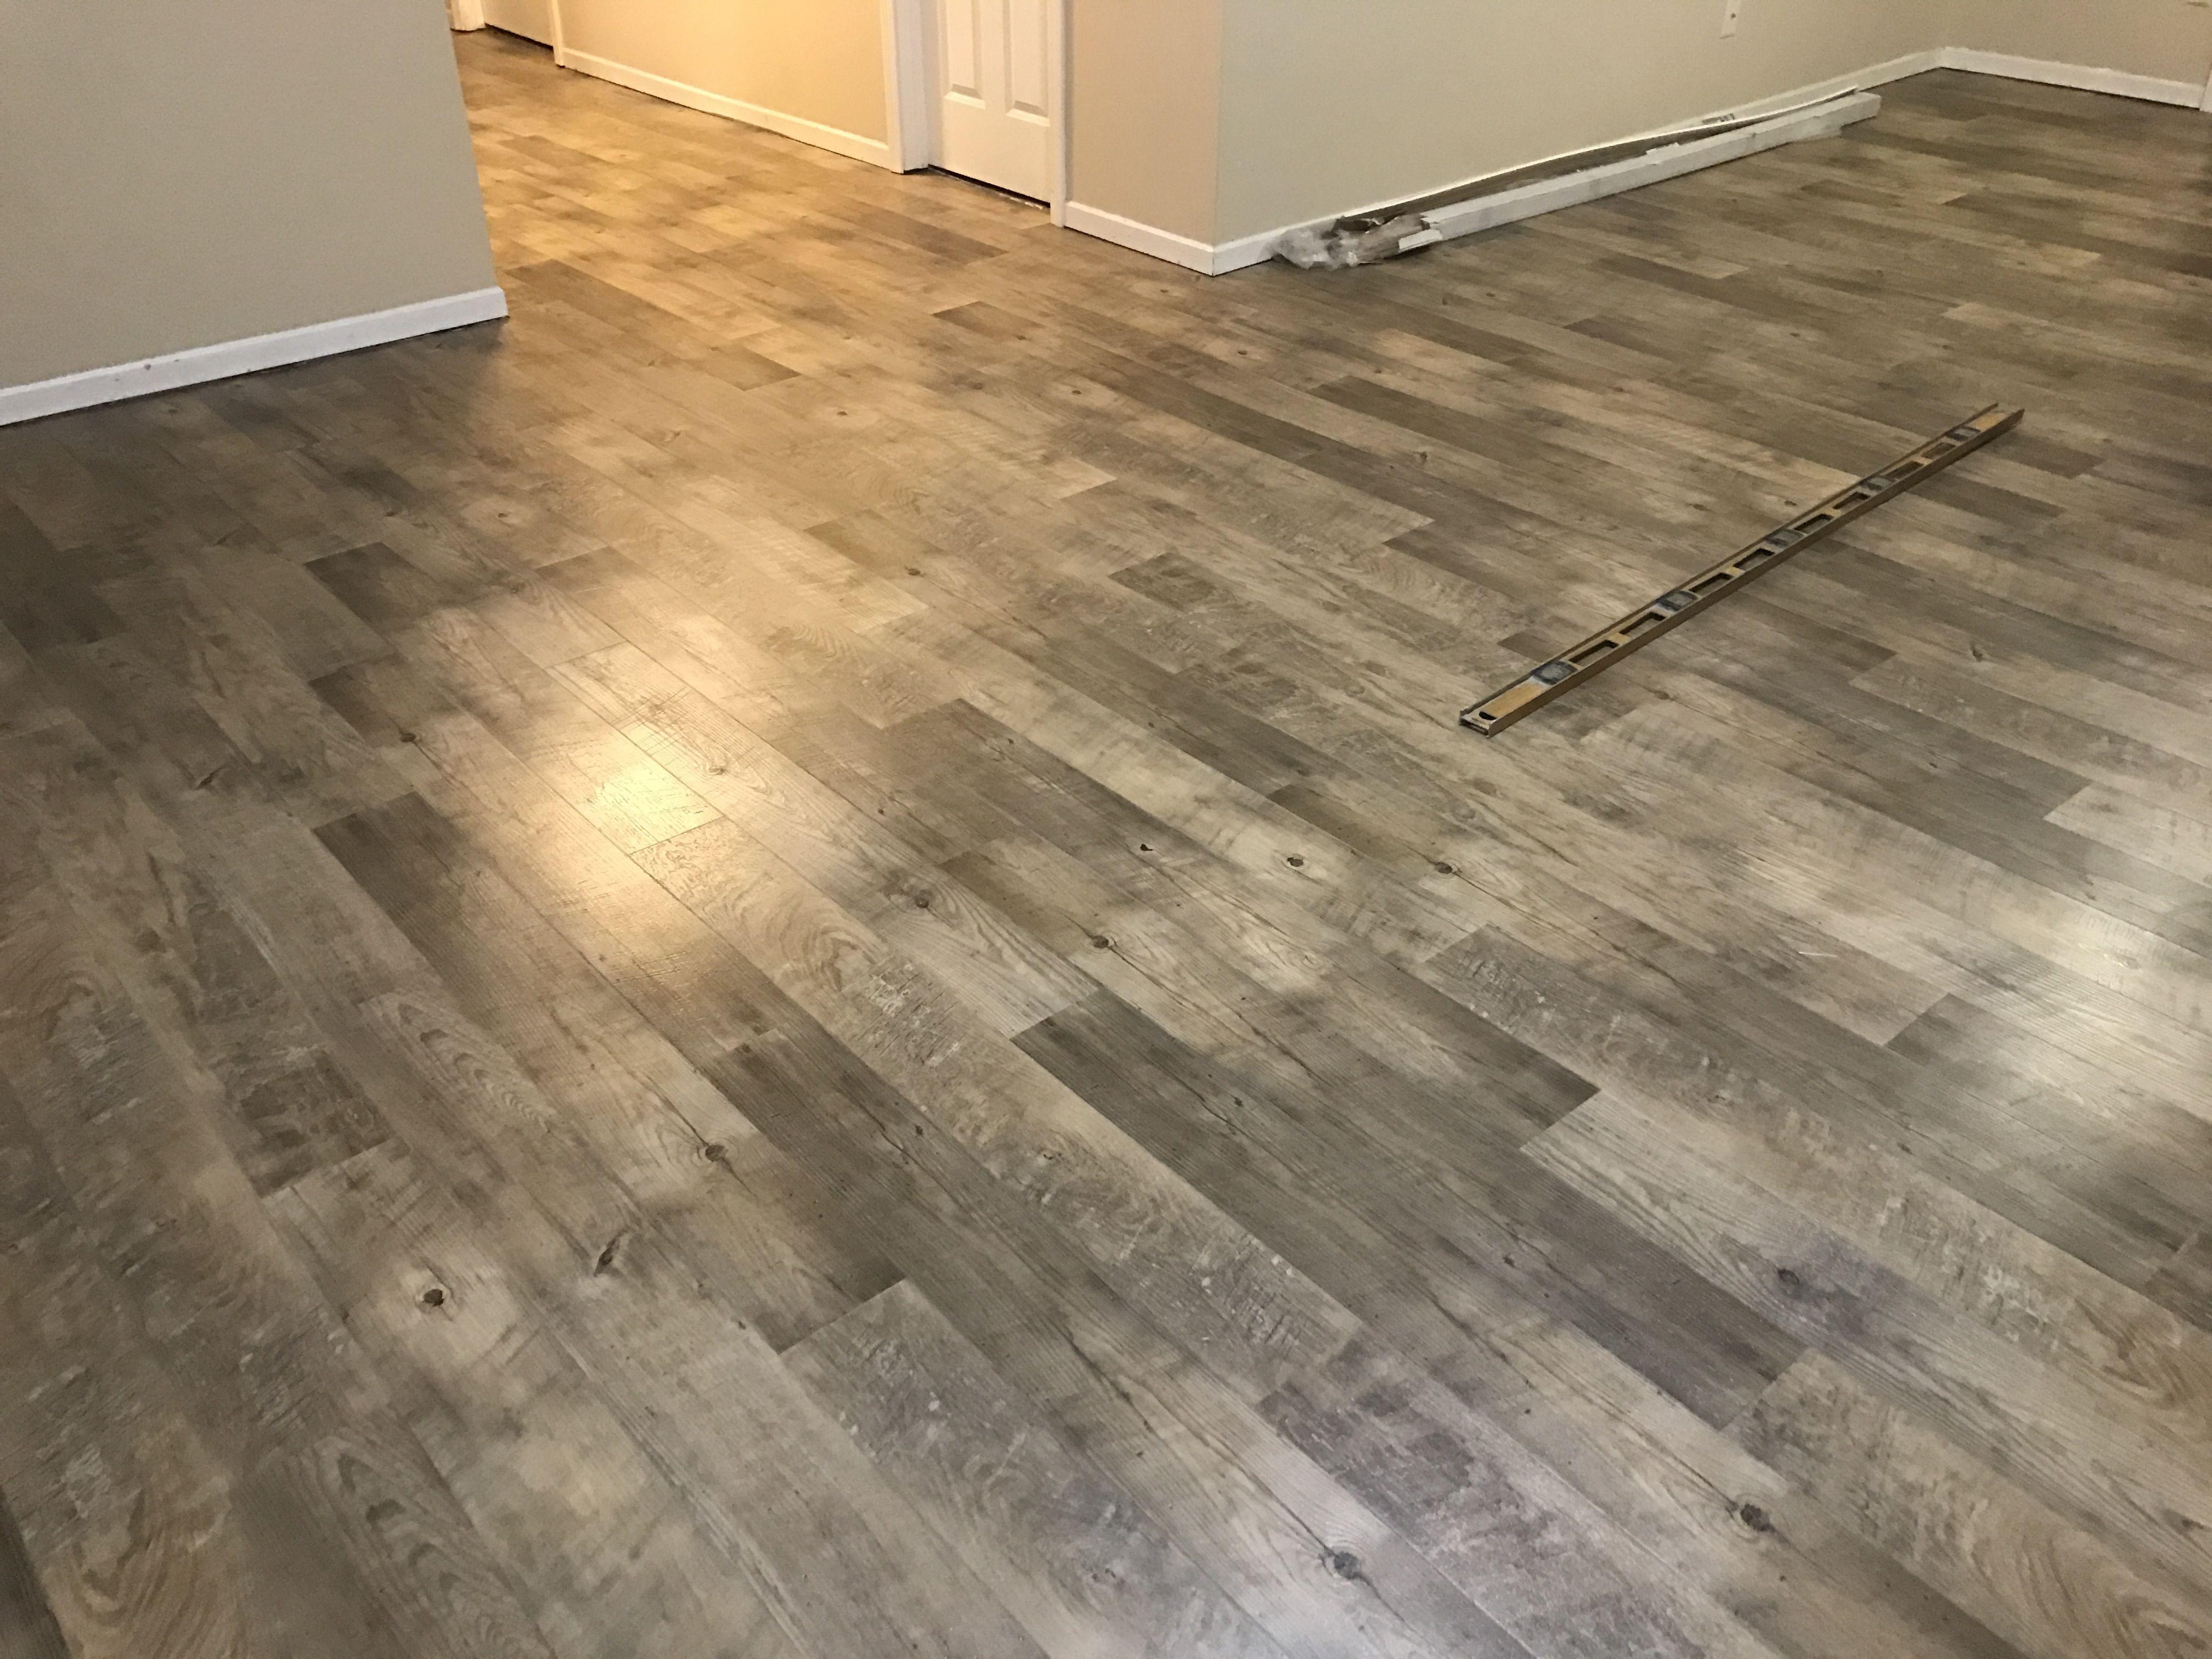 ash hardwood flooring of 19 elegant vinyl plan flooring tirandocodigo net within vinyl plan flooring fresh weathered pine of 19 elegant vinyl plan flooring